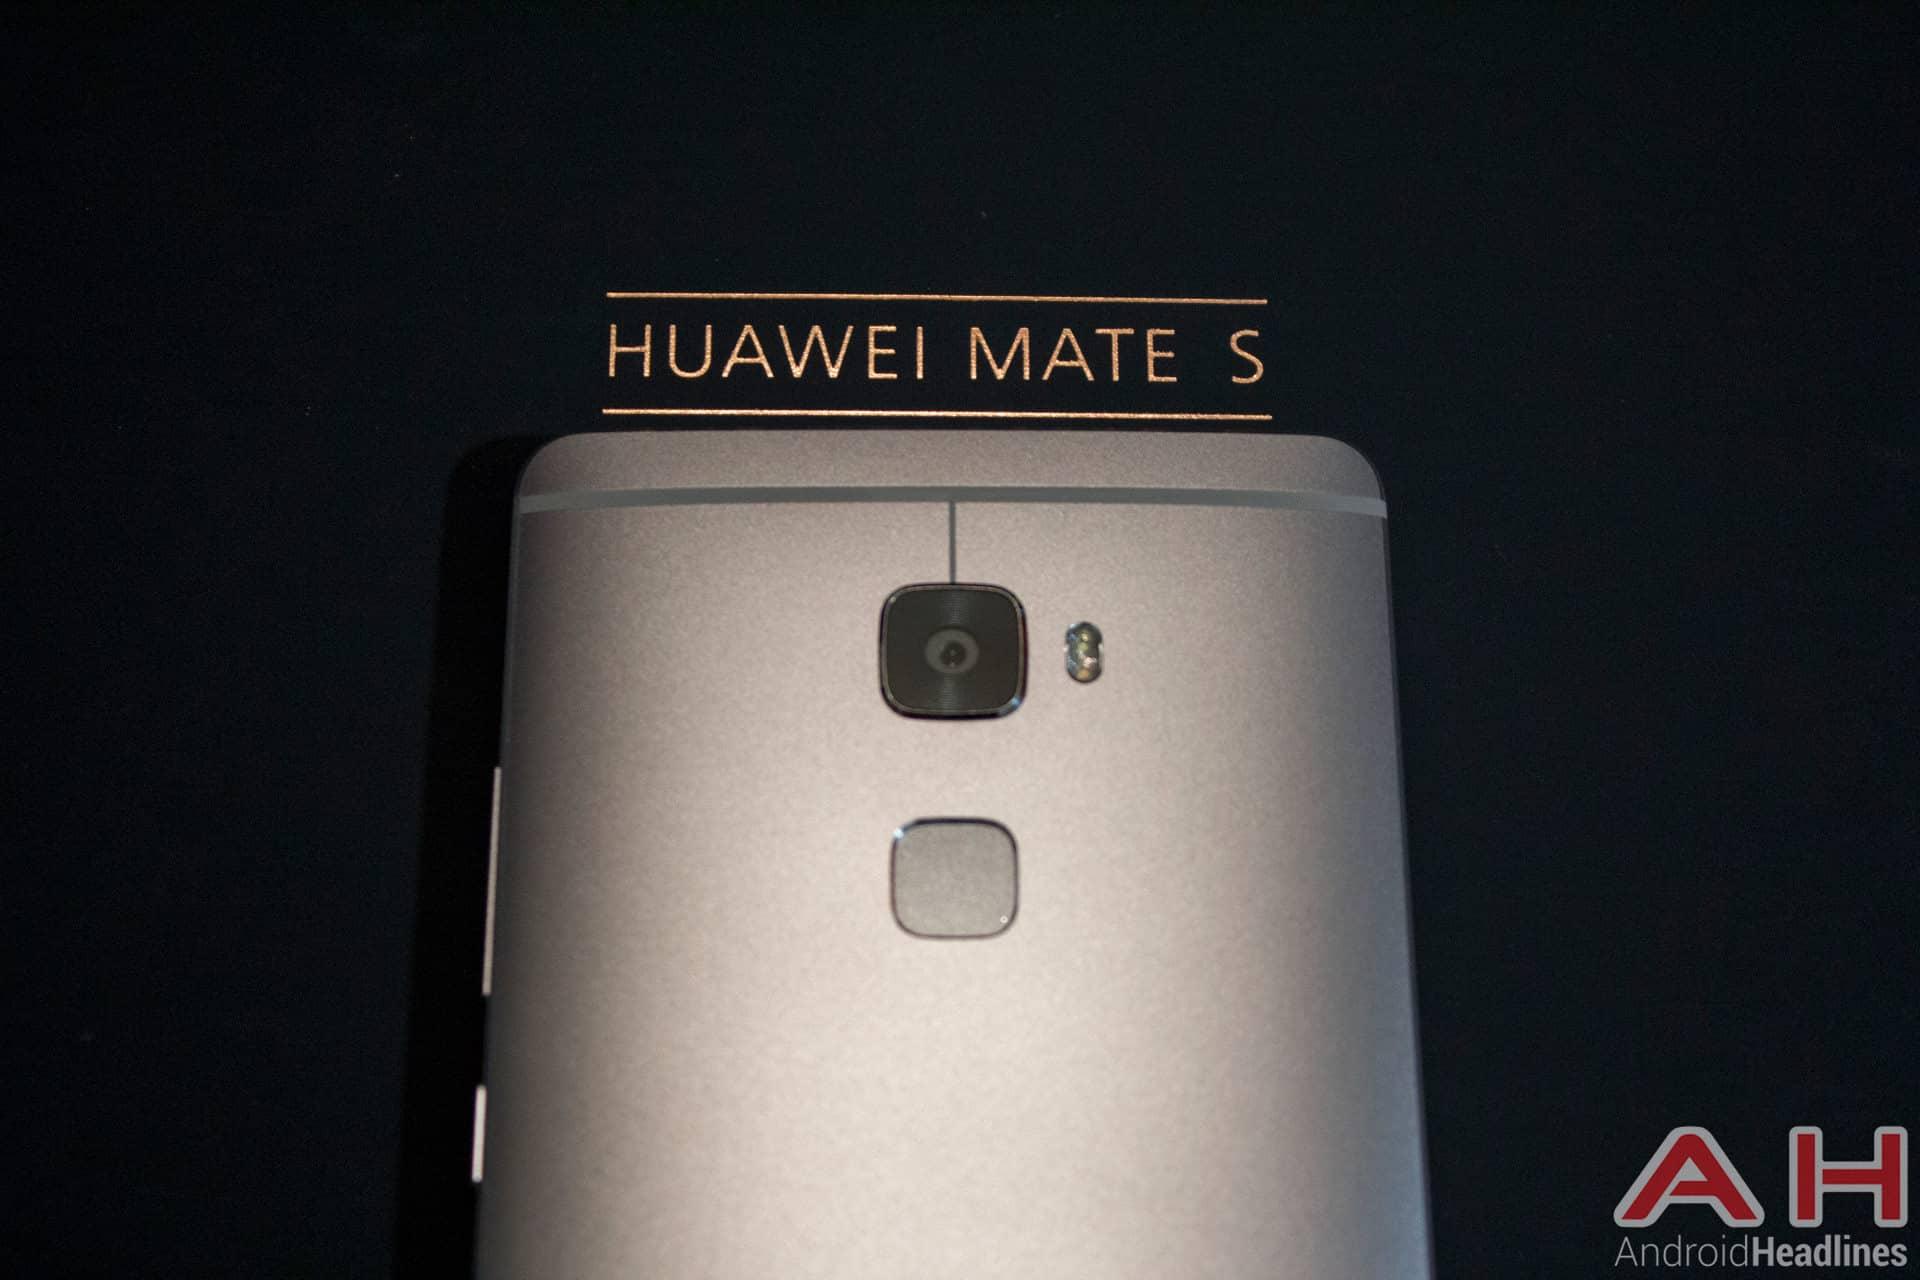 Huawei-Mate-S-AH-NS-box